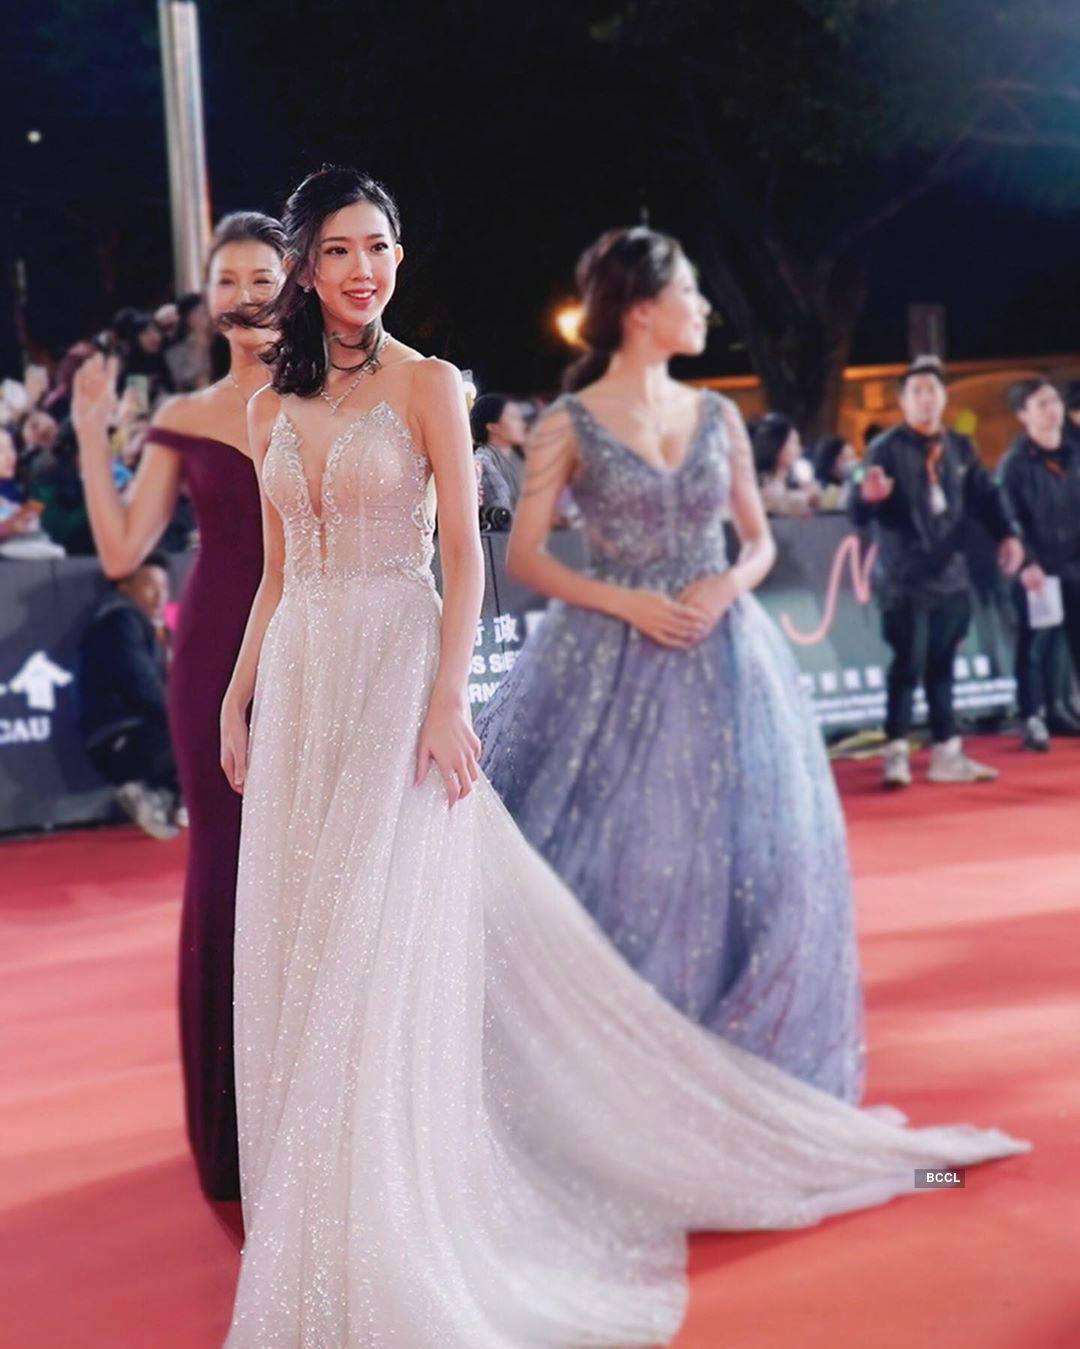 Dinelle Wong crowned Miss International Macau 2020